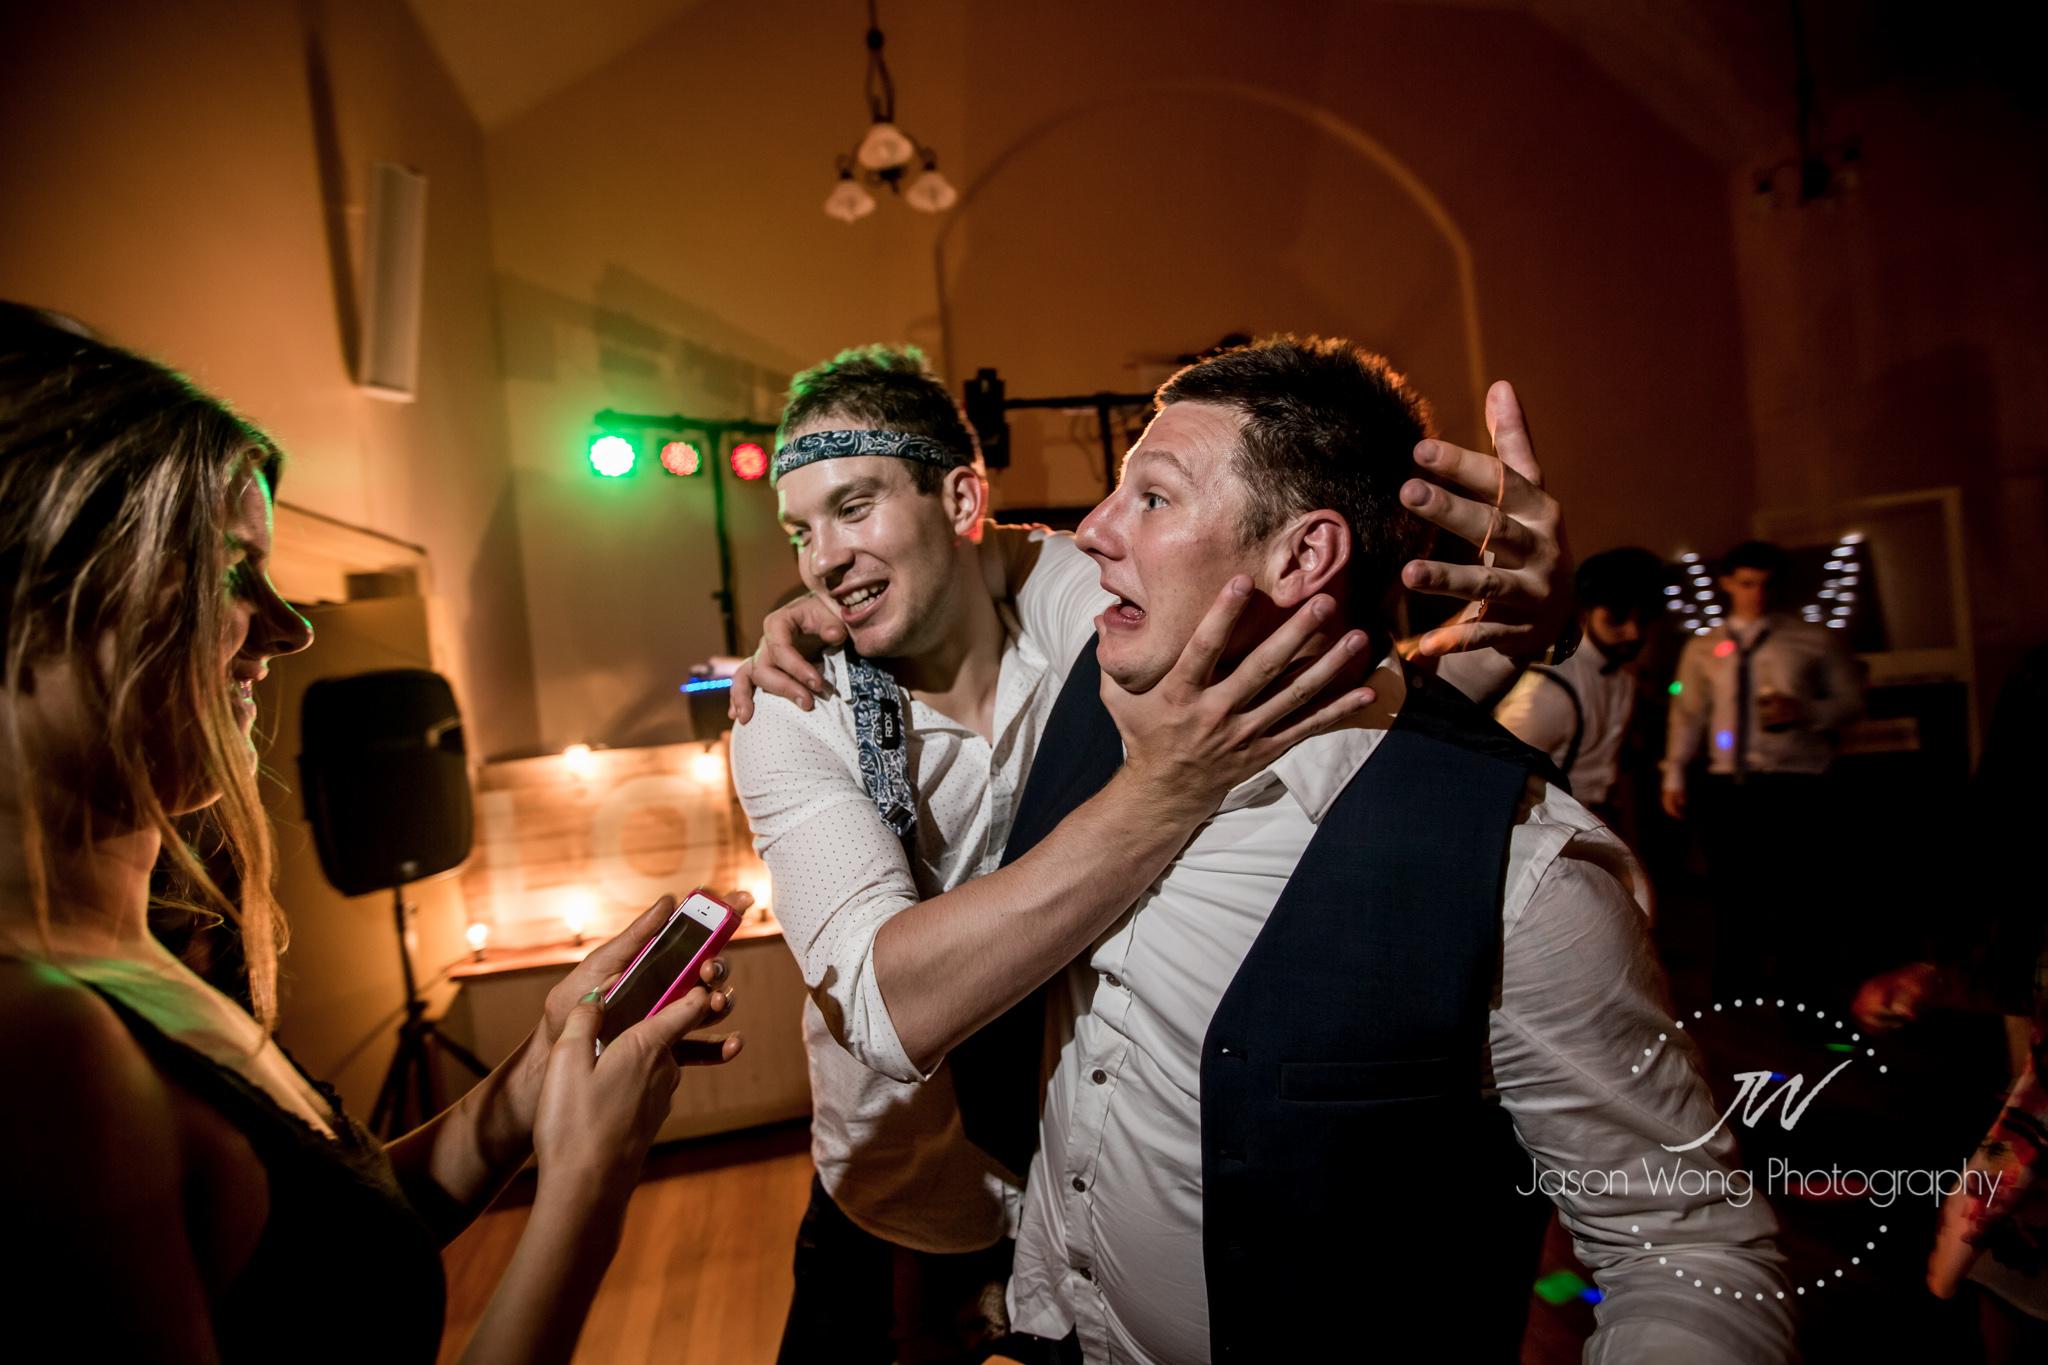 boys-having-fun-during-wedding-reception.jpg